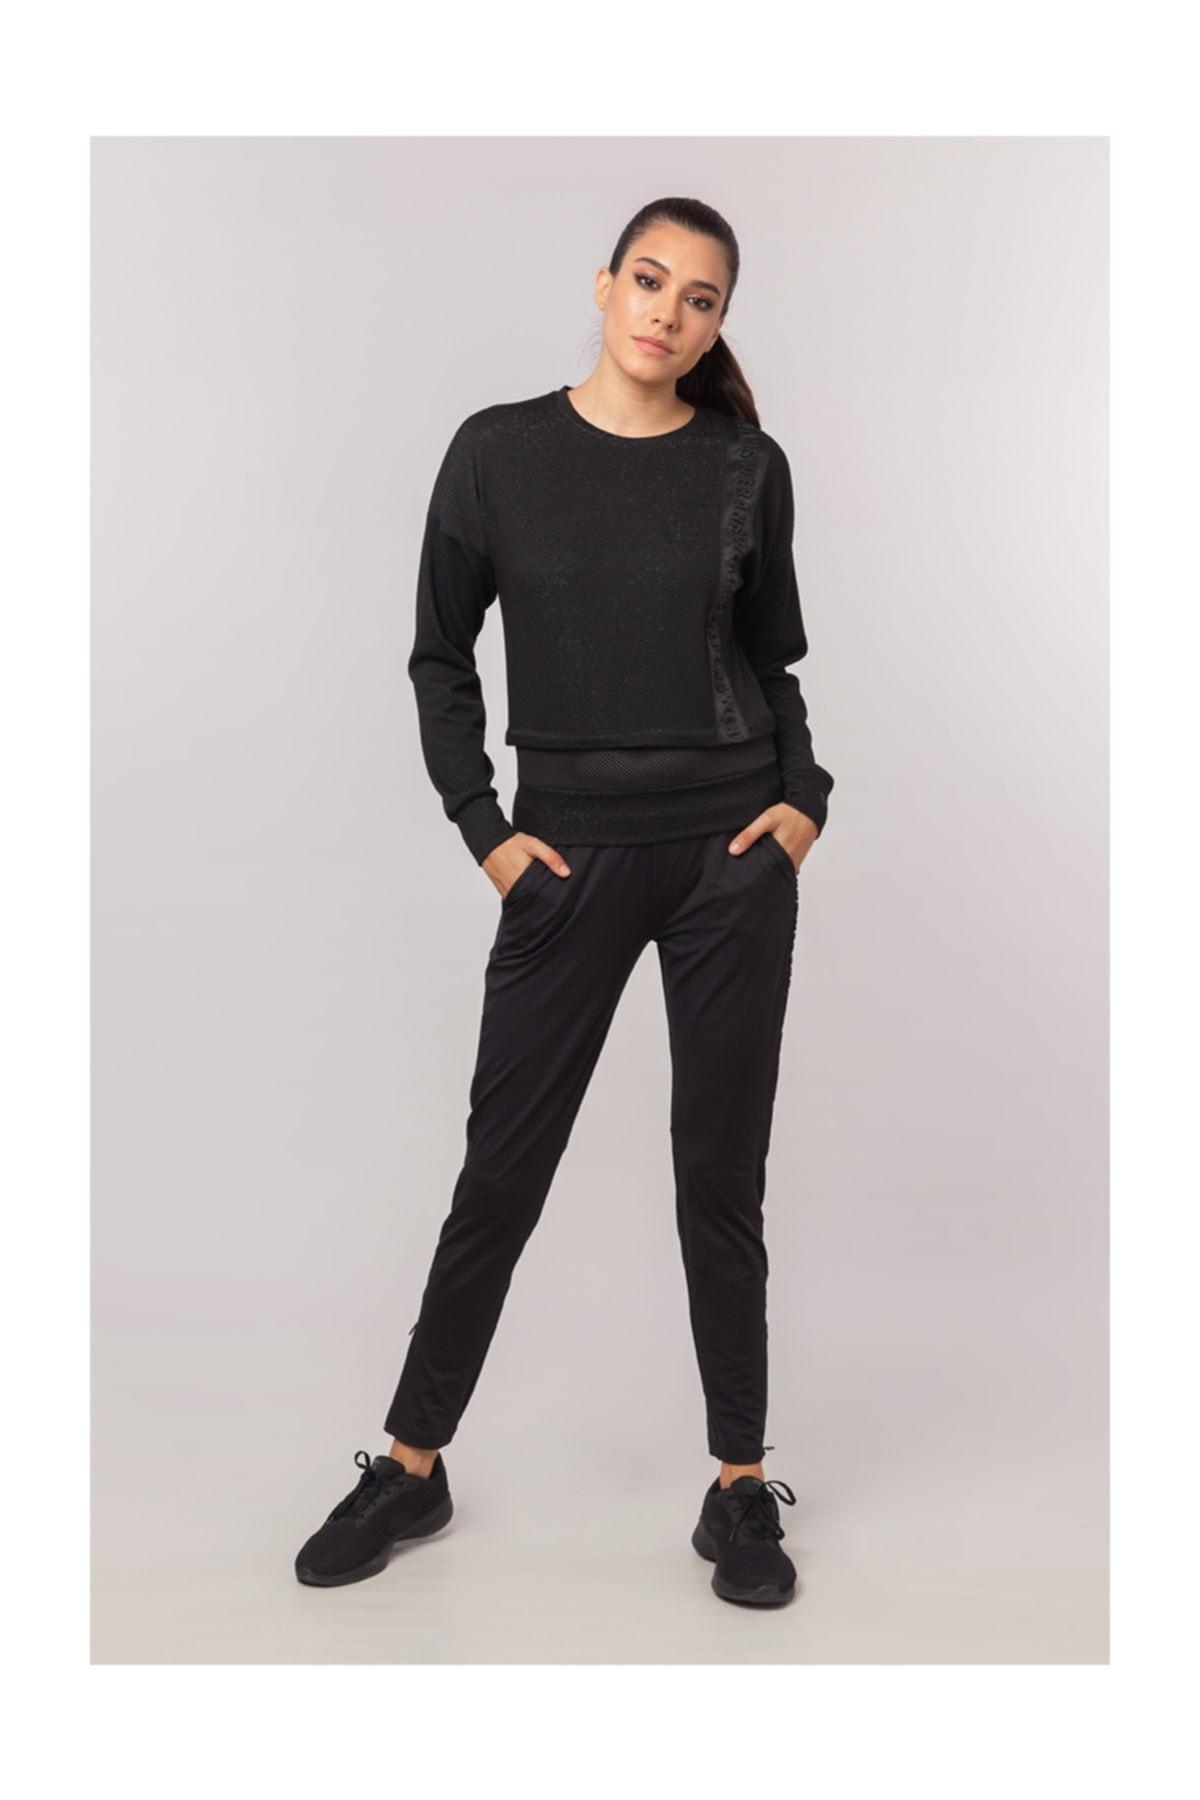 bilcee Siyah Simli Kadın  Sweatshirt EW-3025 2